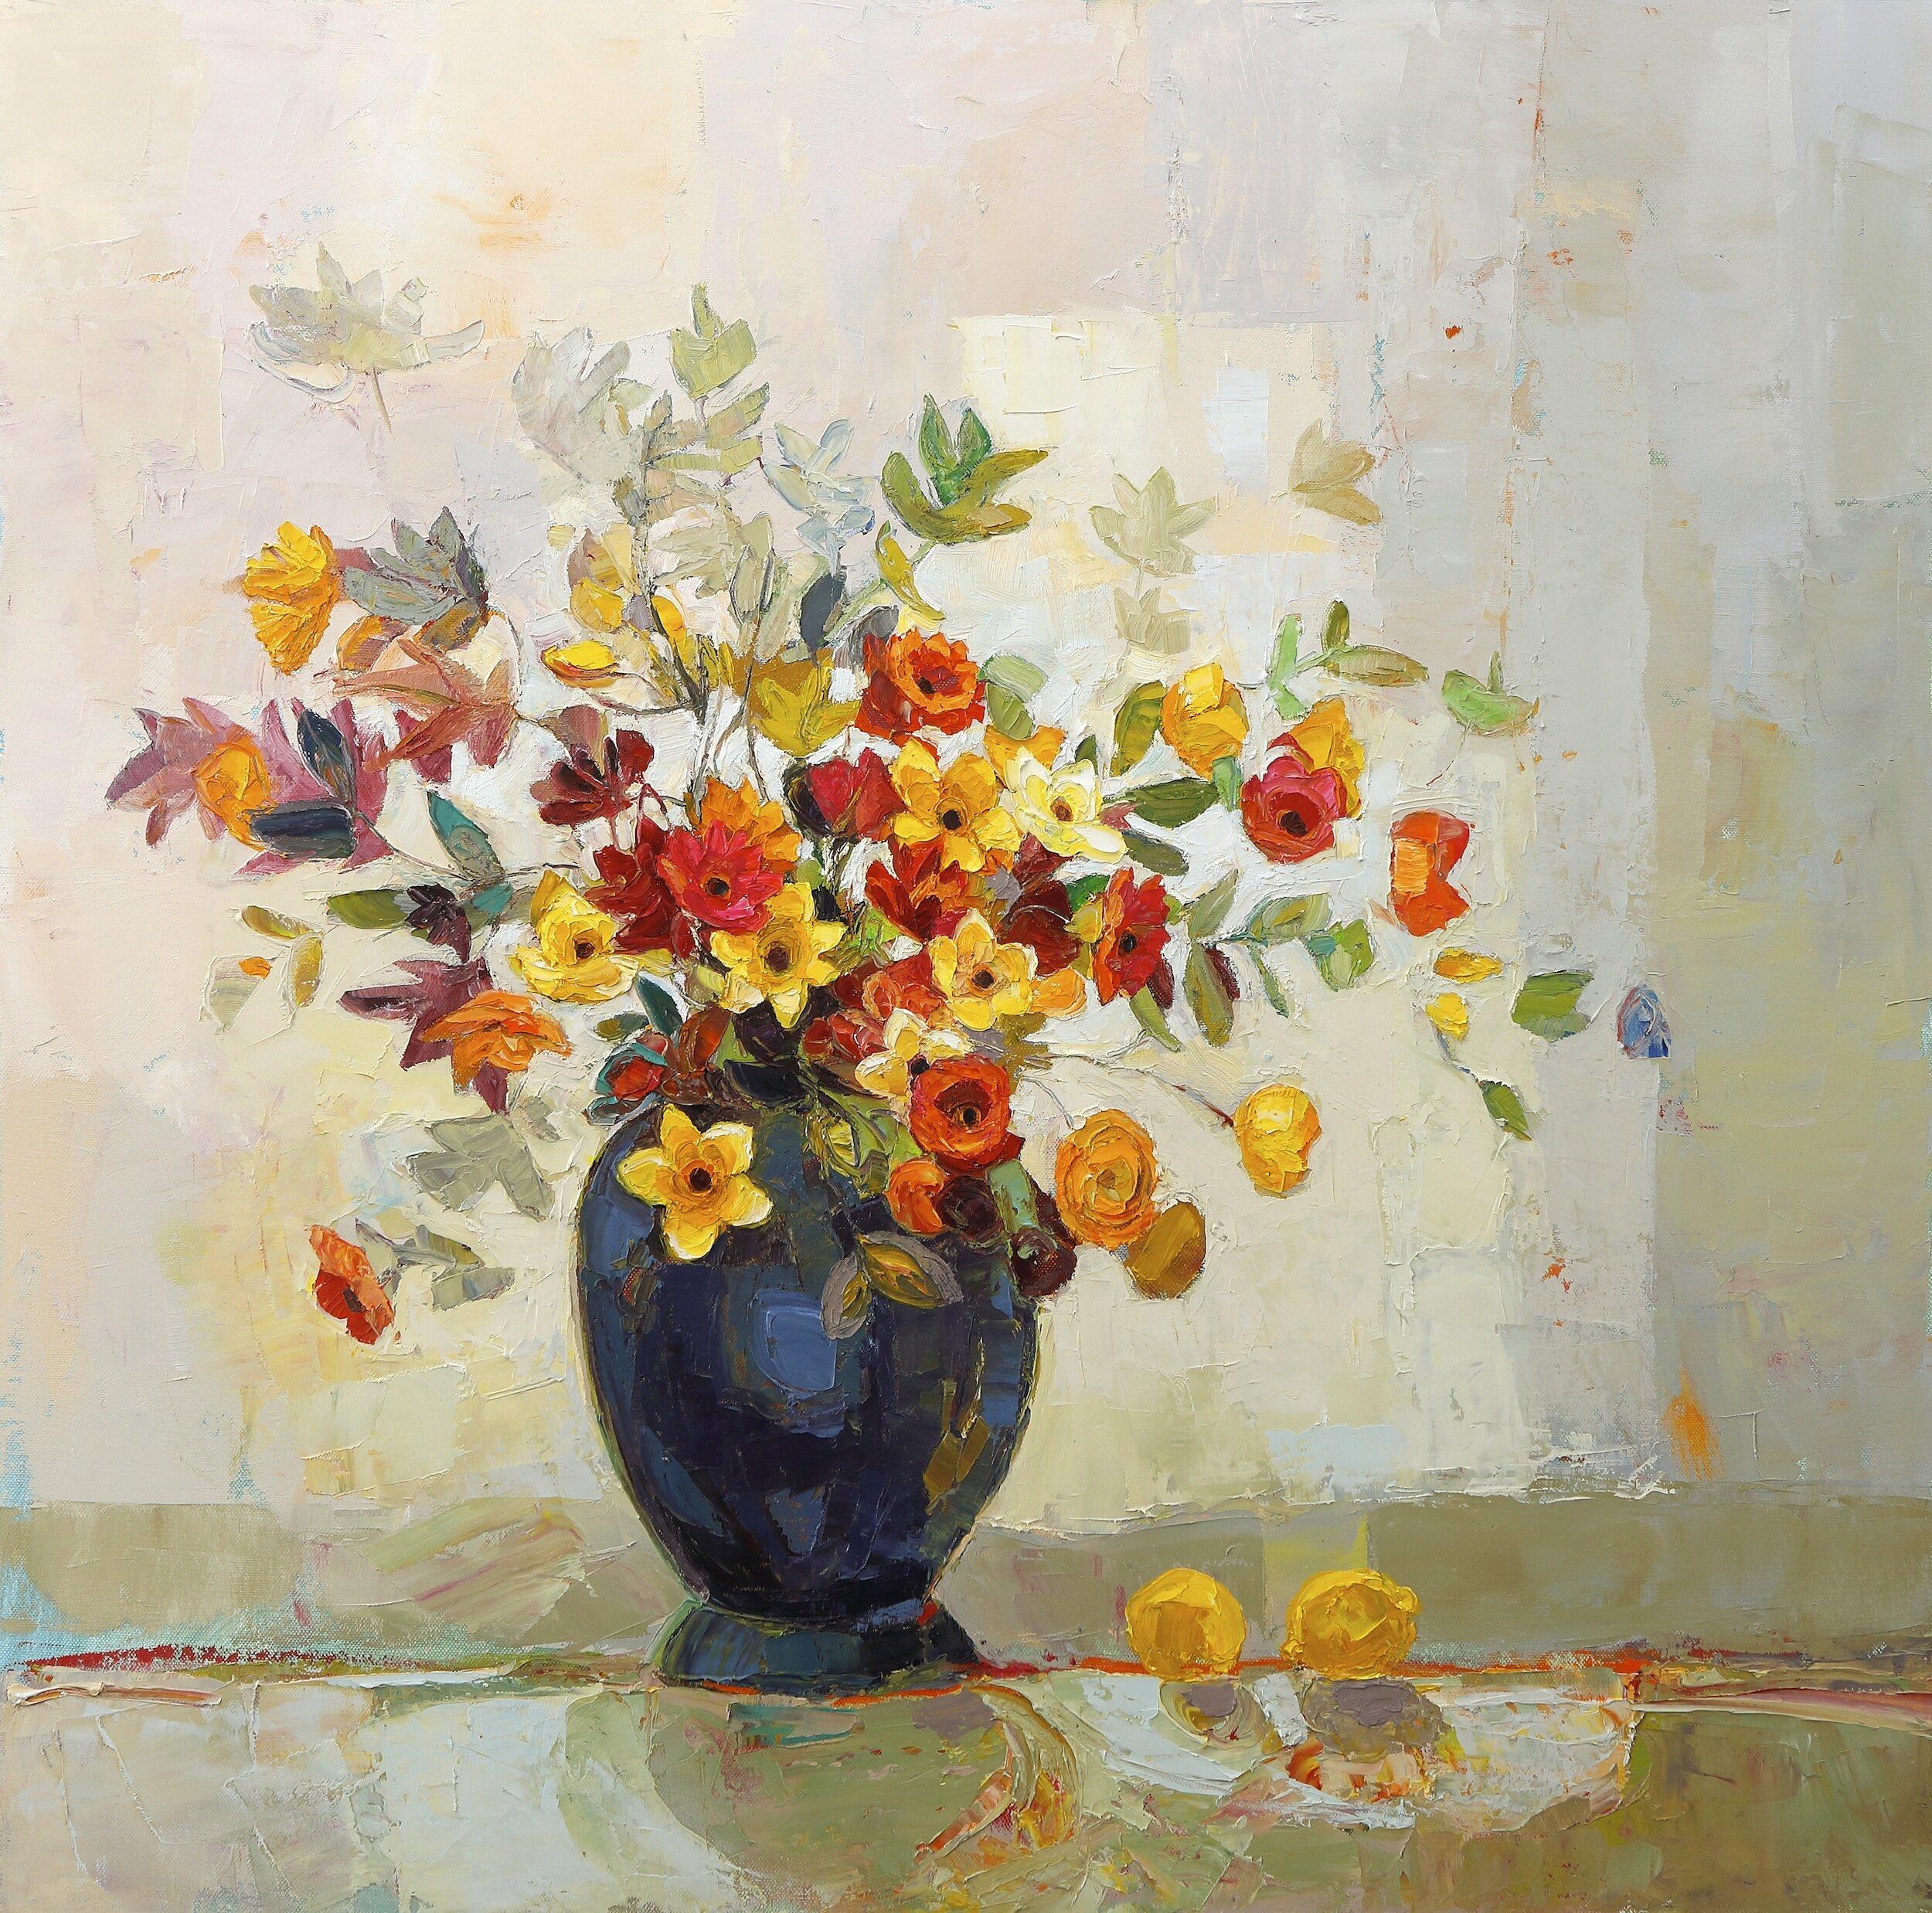 Title: Convivial Big Bunch  Size: 30x30  Medium: Oil on Canvas  Price: £4950